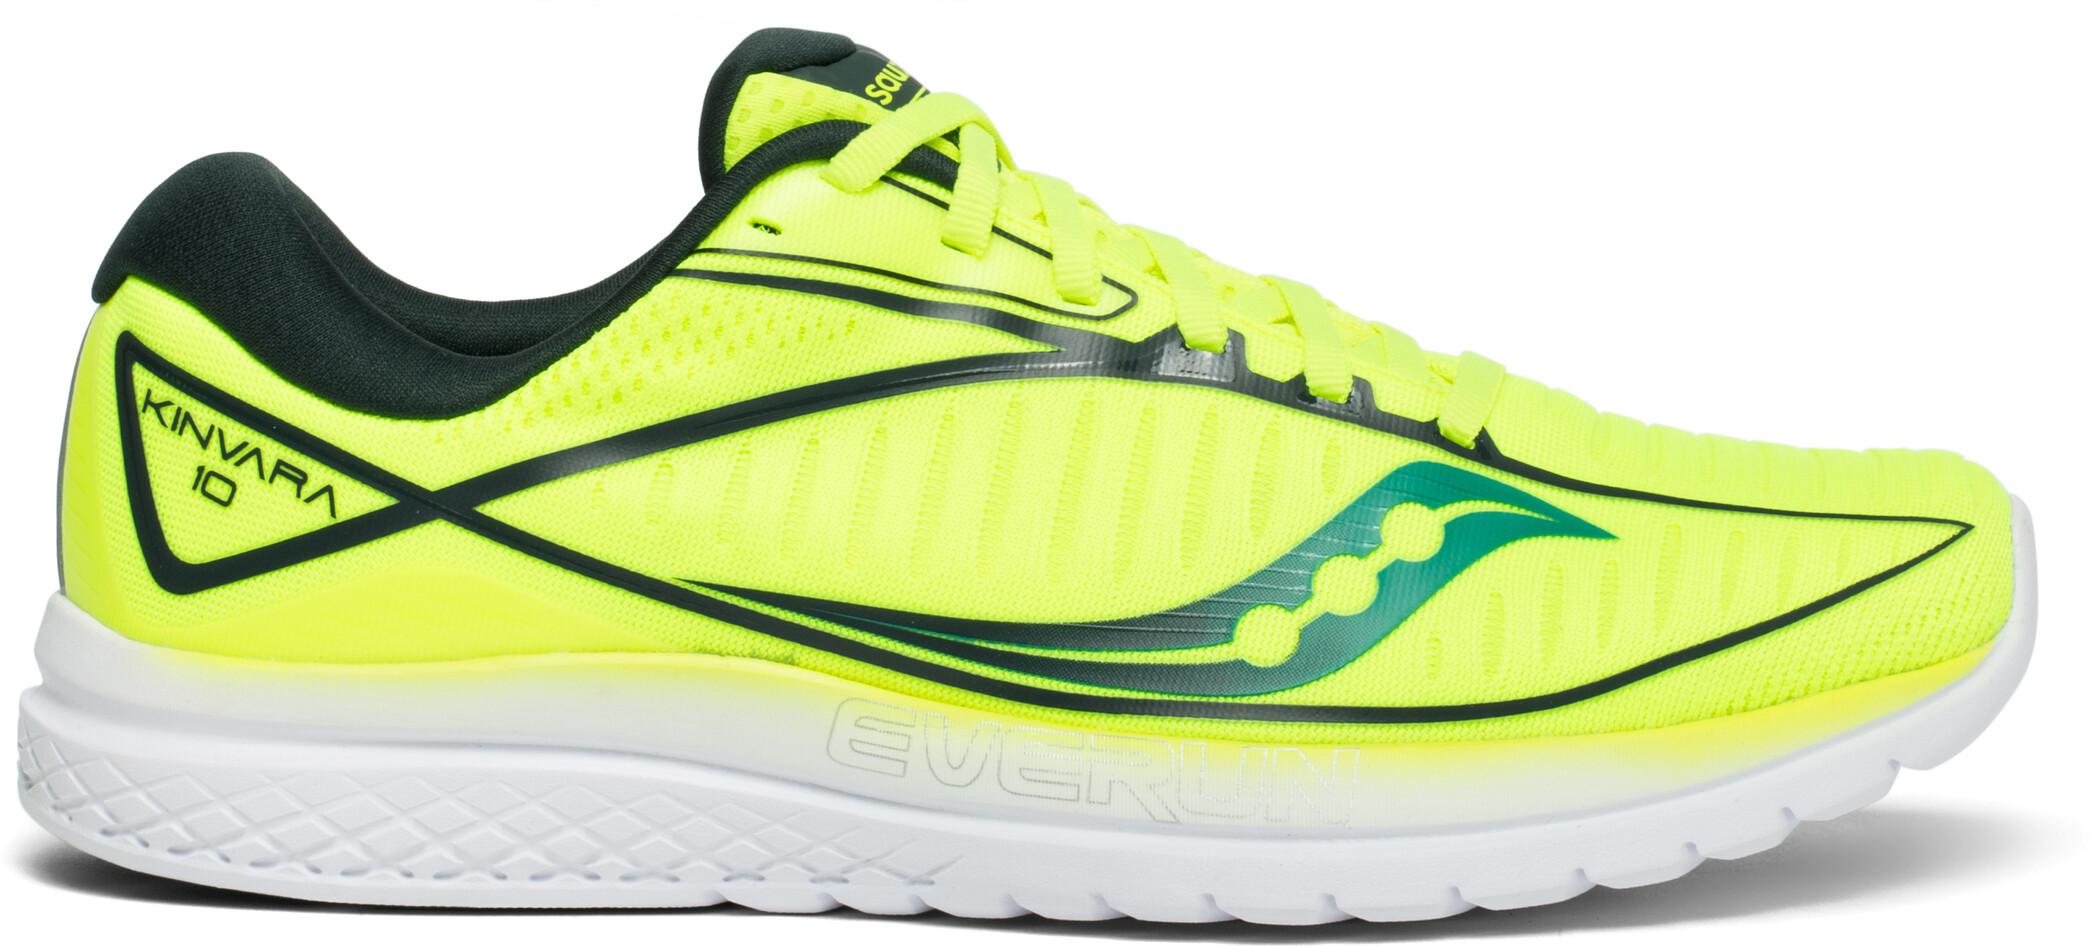 saucony Kinvara 10 Shoes Men, citron/teal (2019) | Running shoes